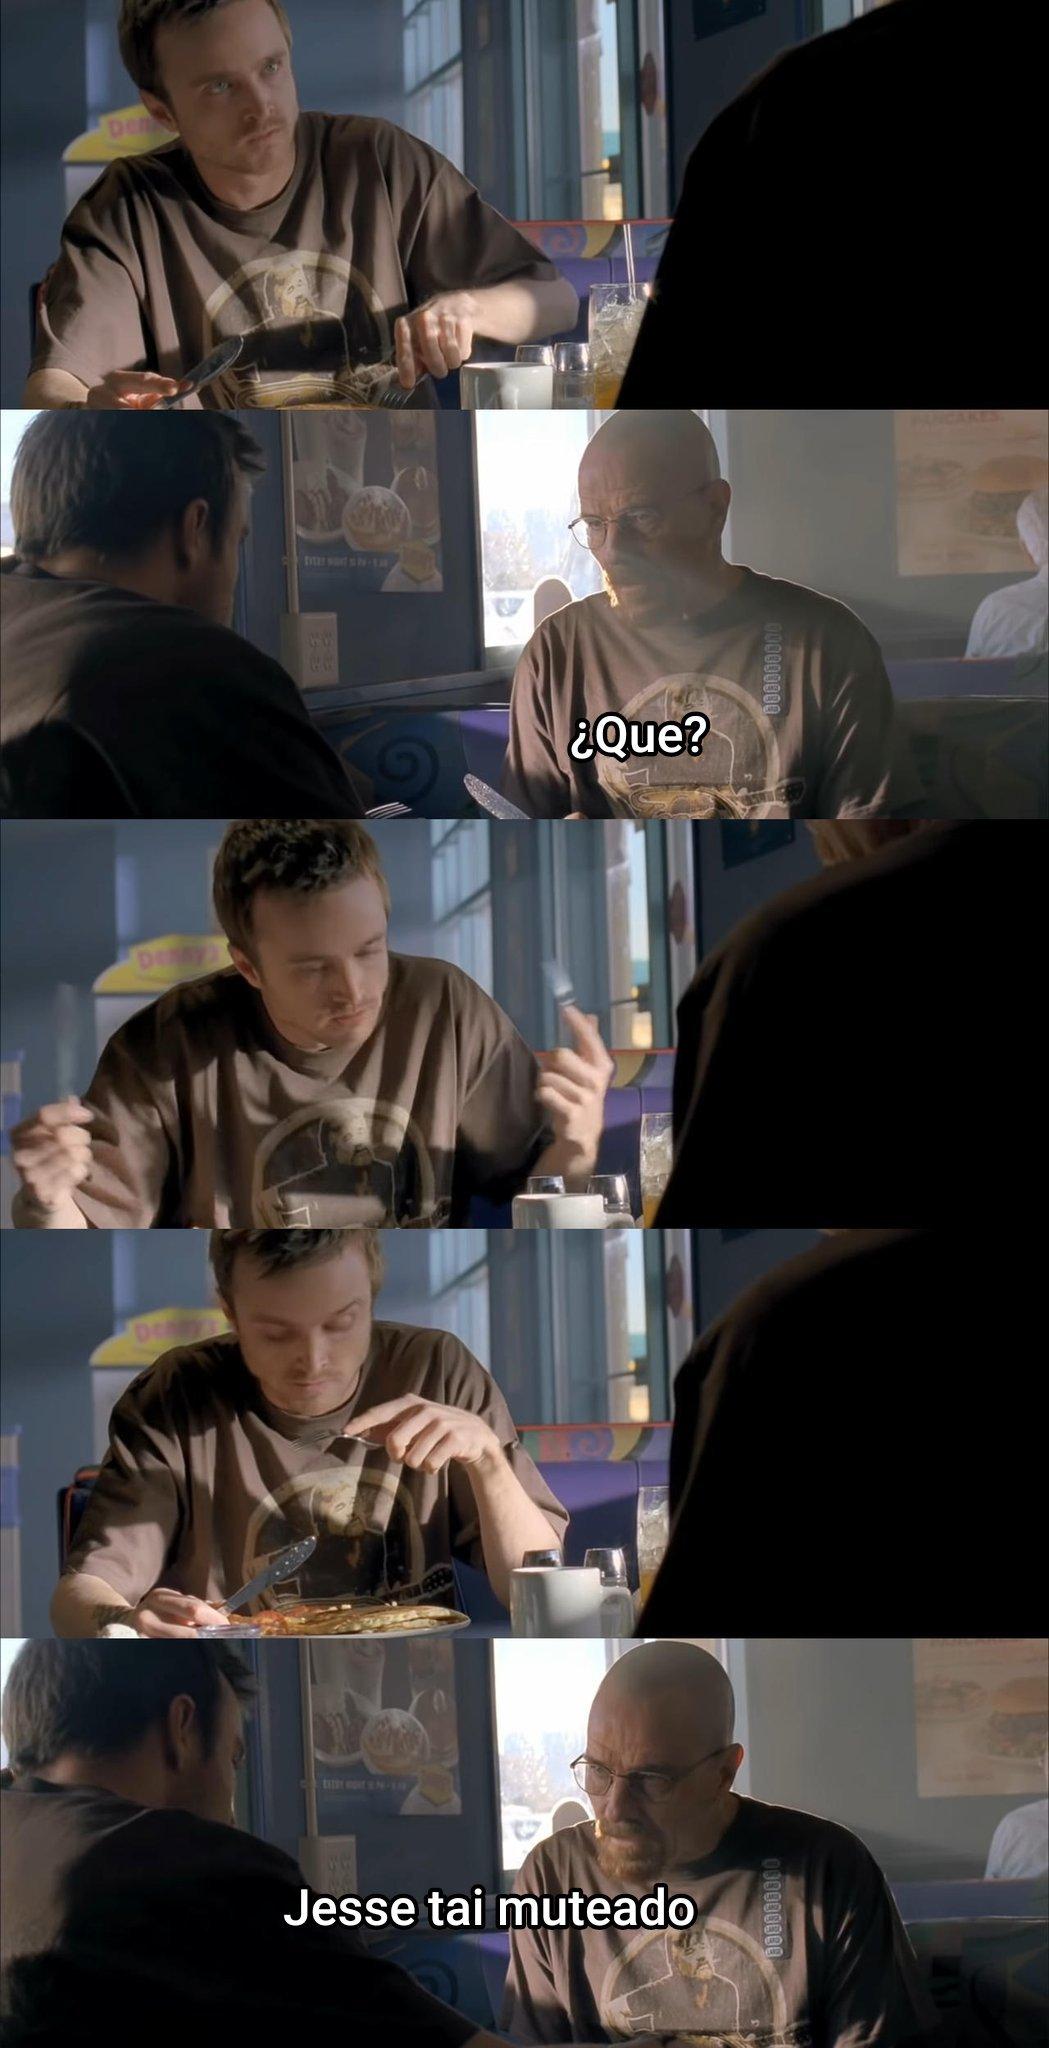 Jesse estai muteado - meme